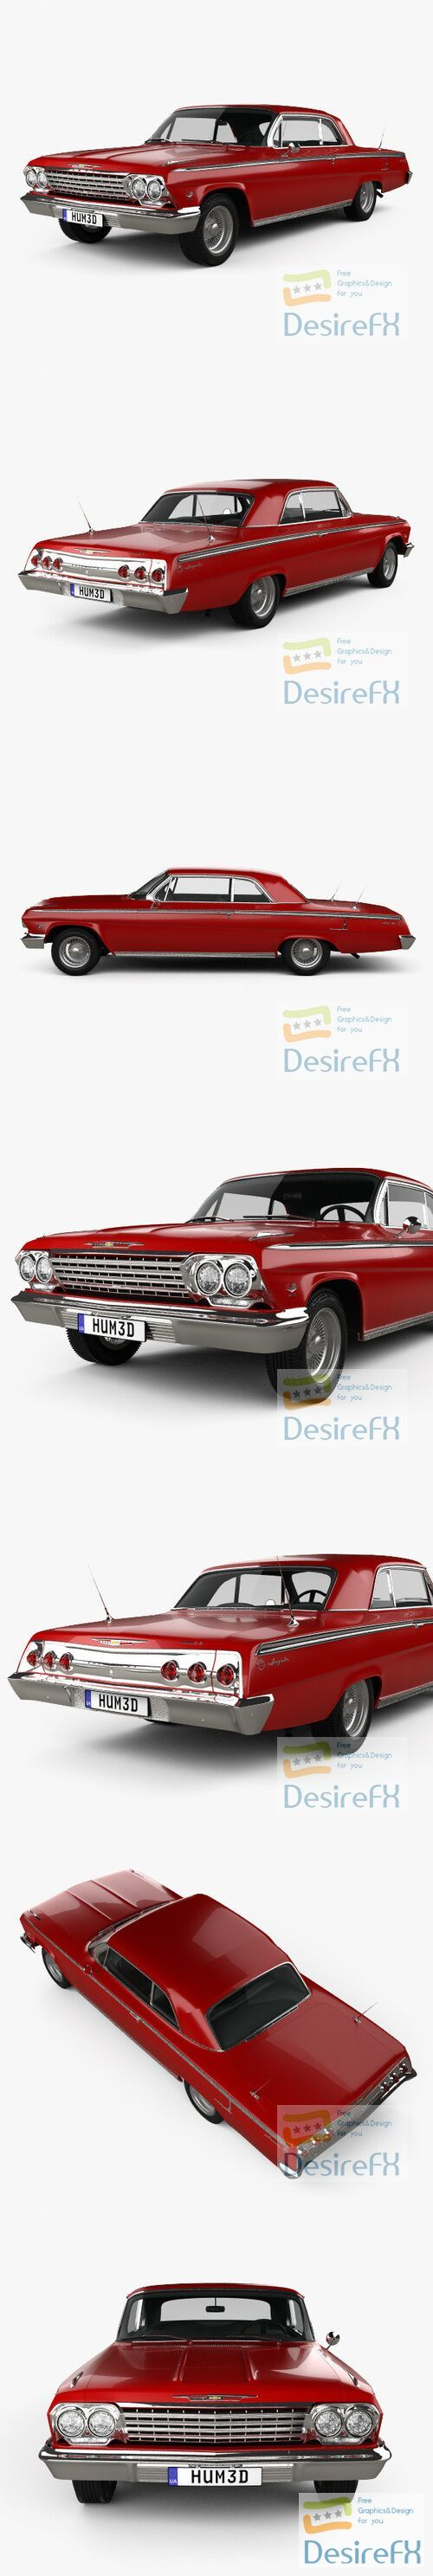 Chevrolet Impala SS 409 1962 3D Model